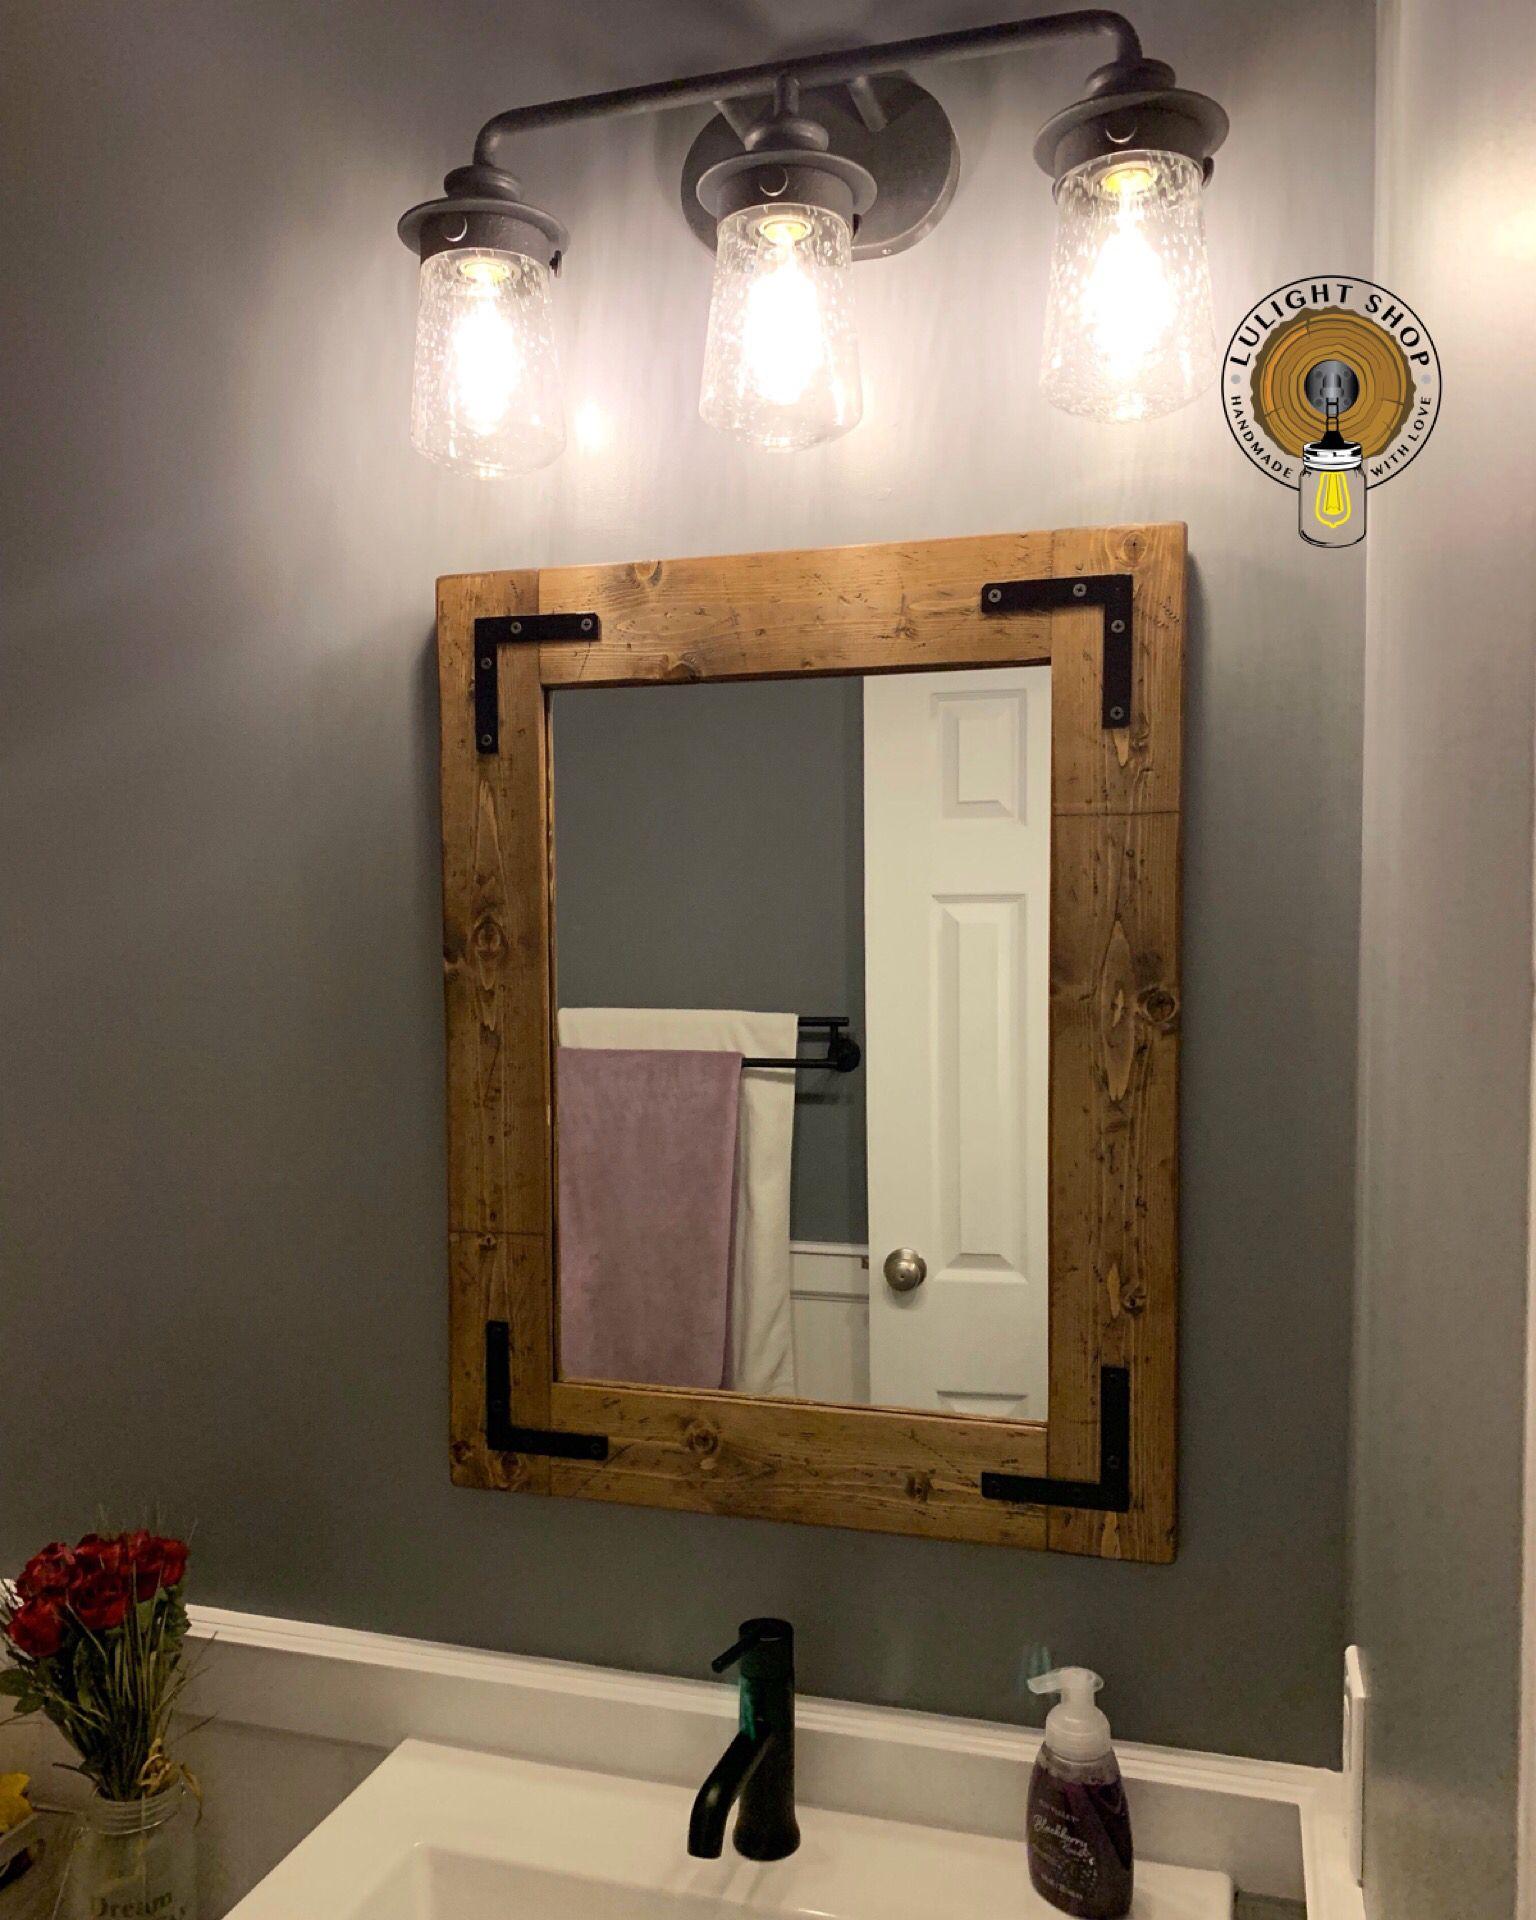 Handmade Farmhouse Rustic Lighting And Home Decor By Lulight Rustic Bathroom Light Fixtures Bathroom Mirror Bathroom Mirror Frame